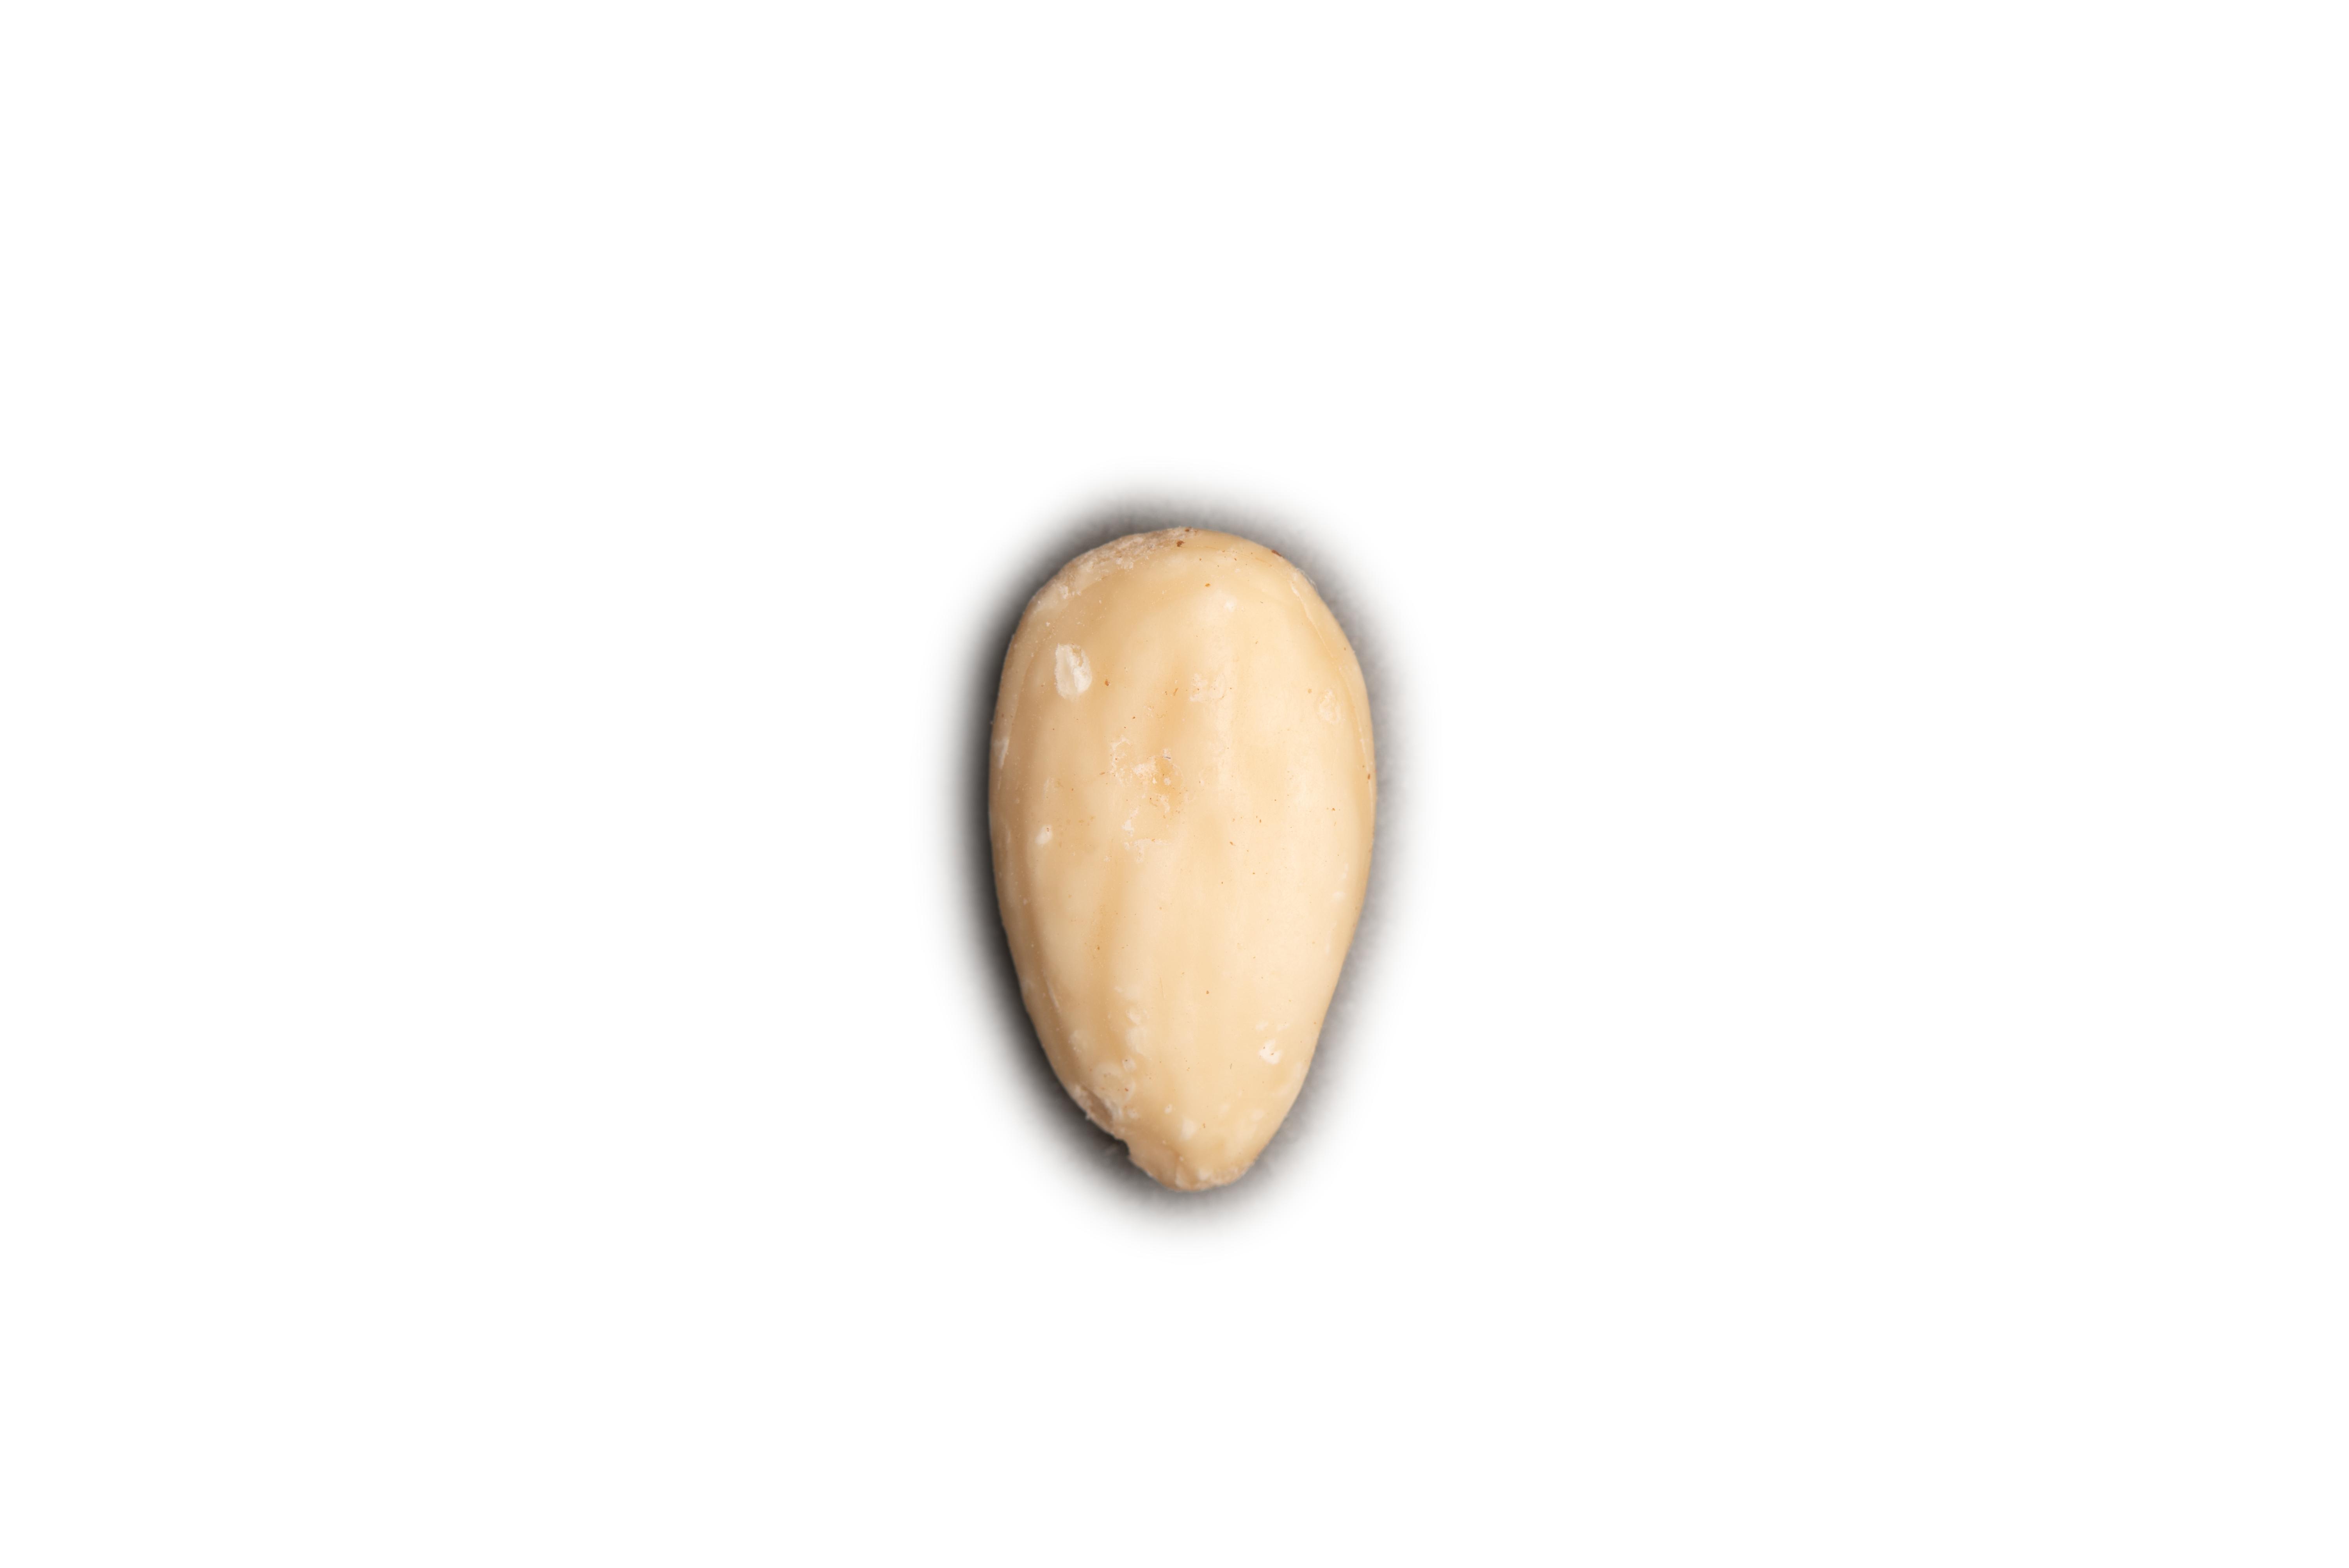 Nut-5